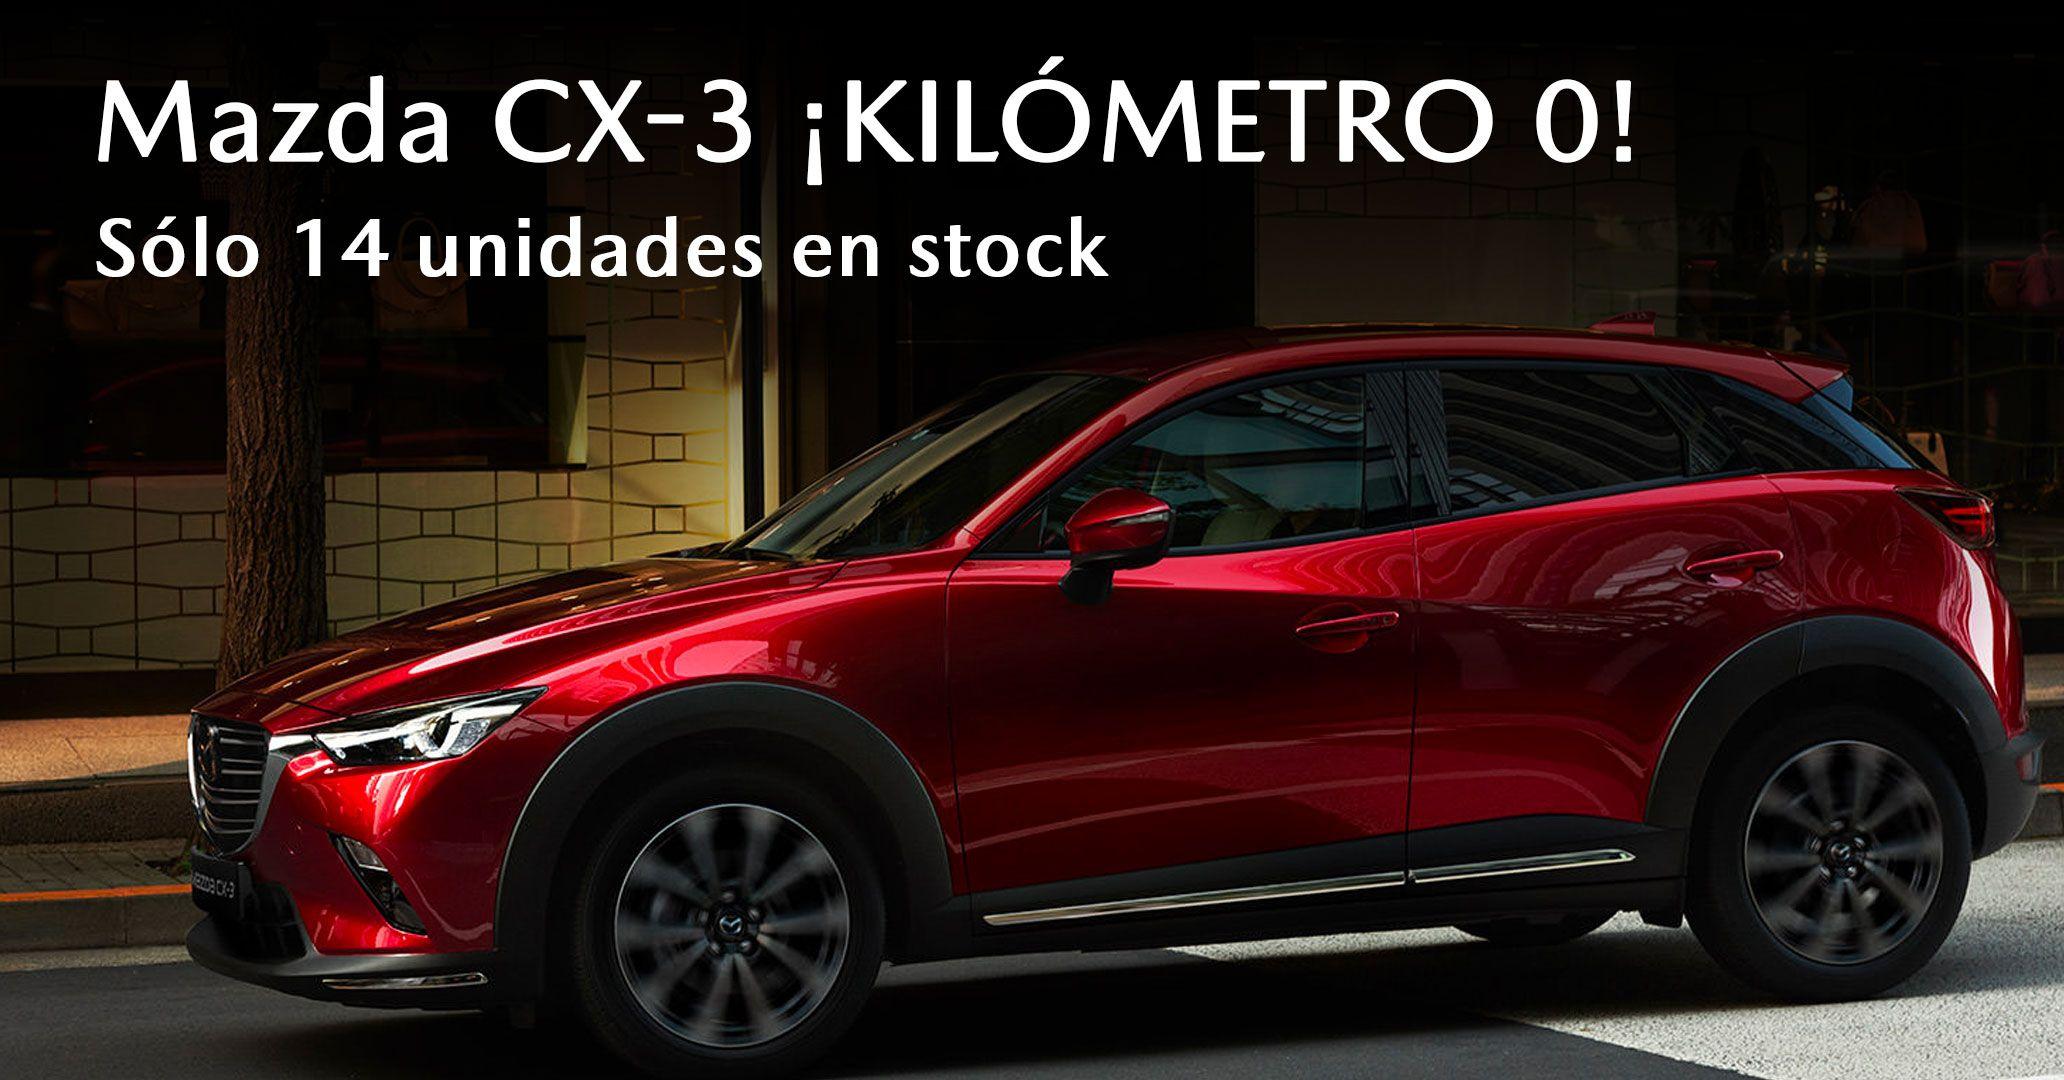 ¡Oferta irrepetible! Mazda CX-3 Kilómetro 0 por Por 21.350€*